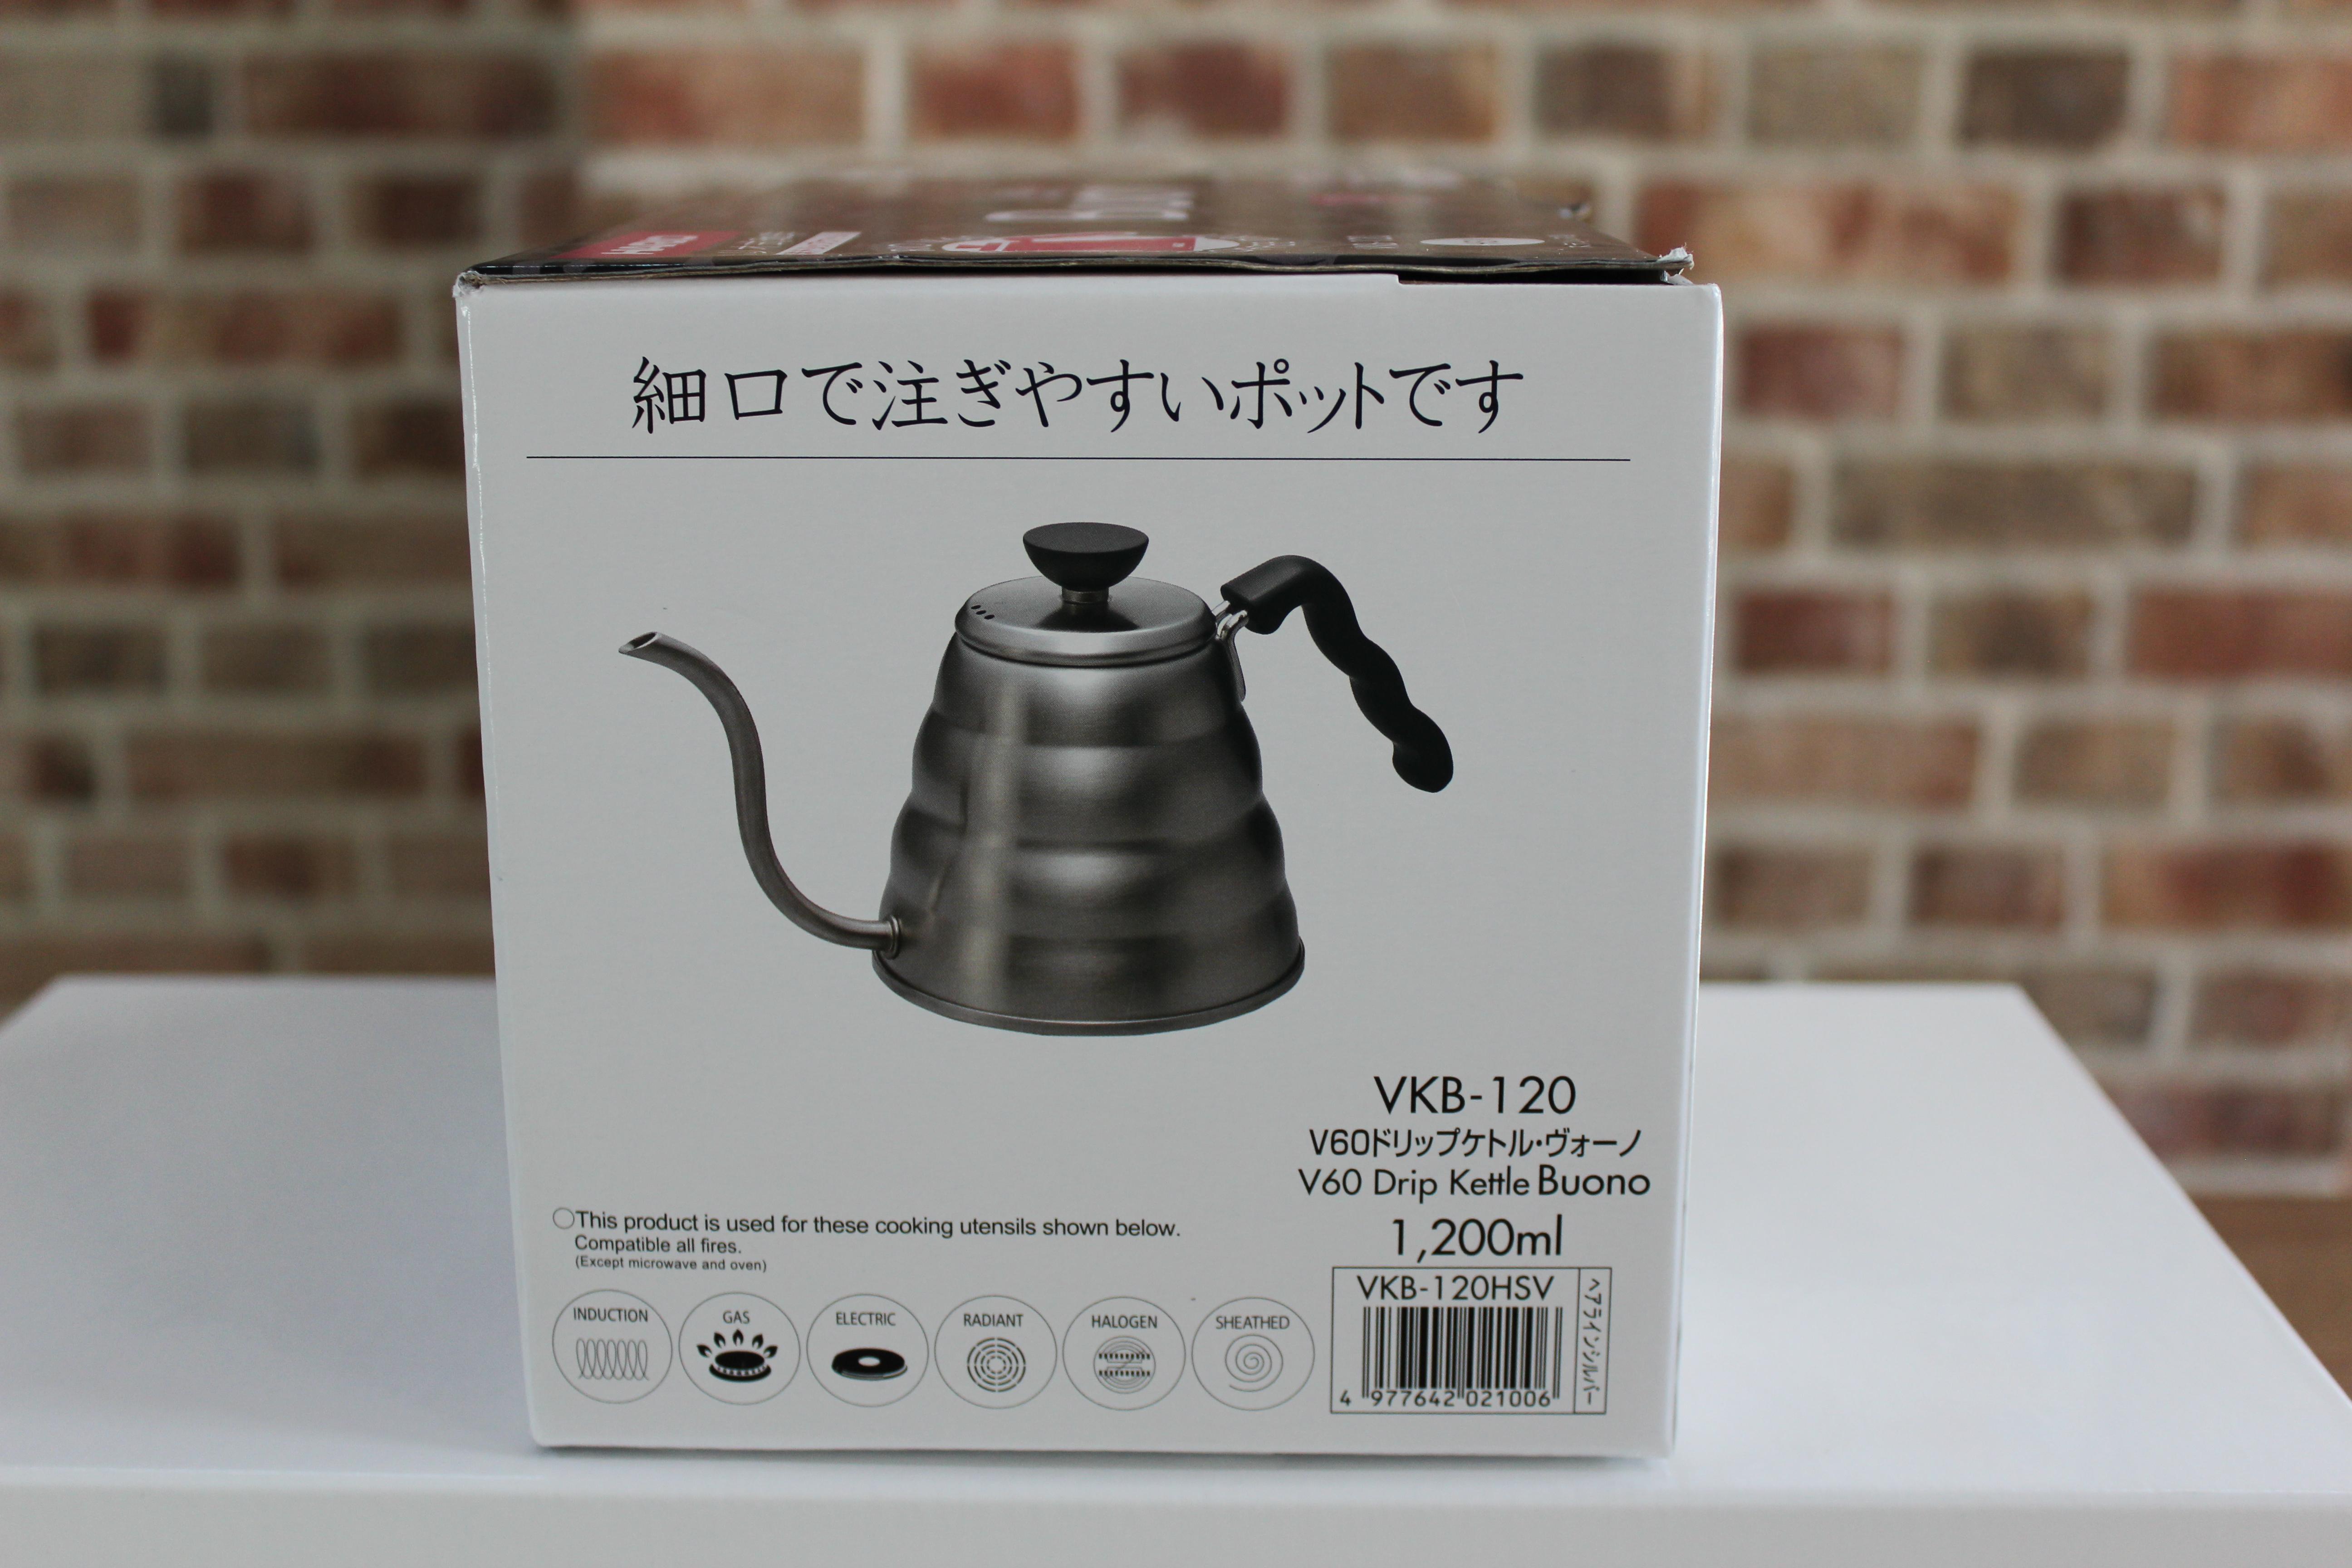 Coffee drip kettle Buono von Hario